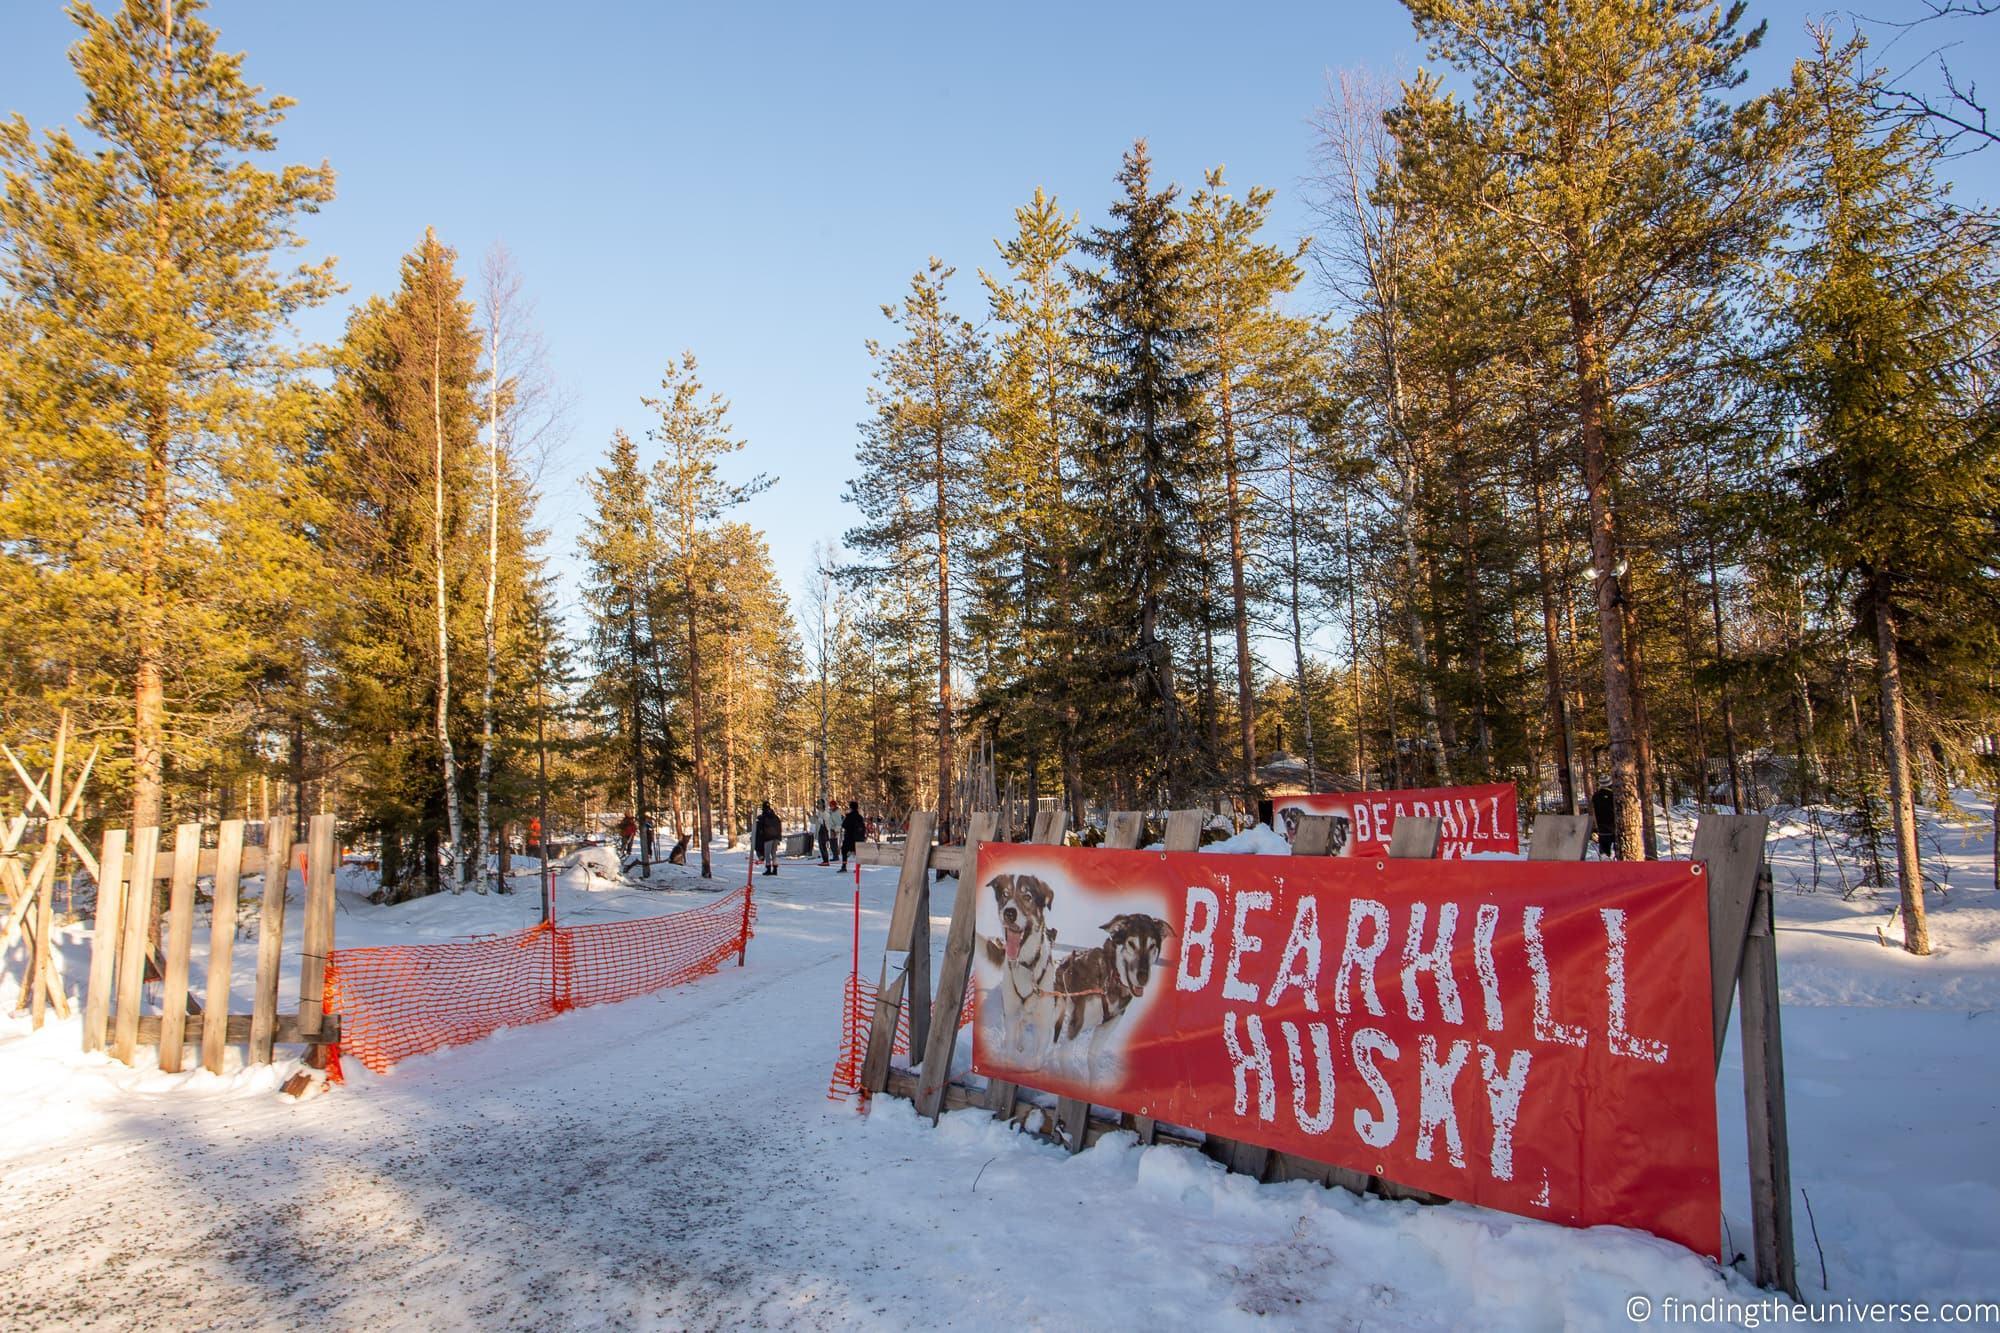 Bearhill husky Rovaniemi